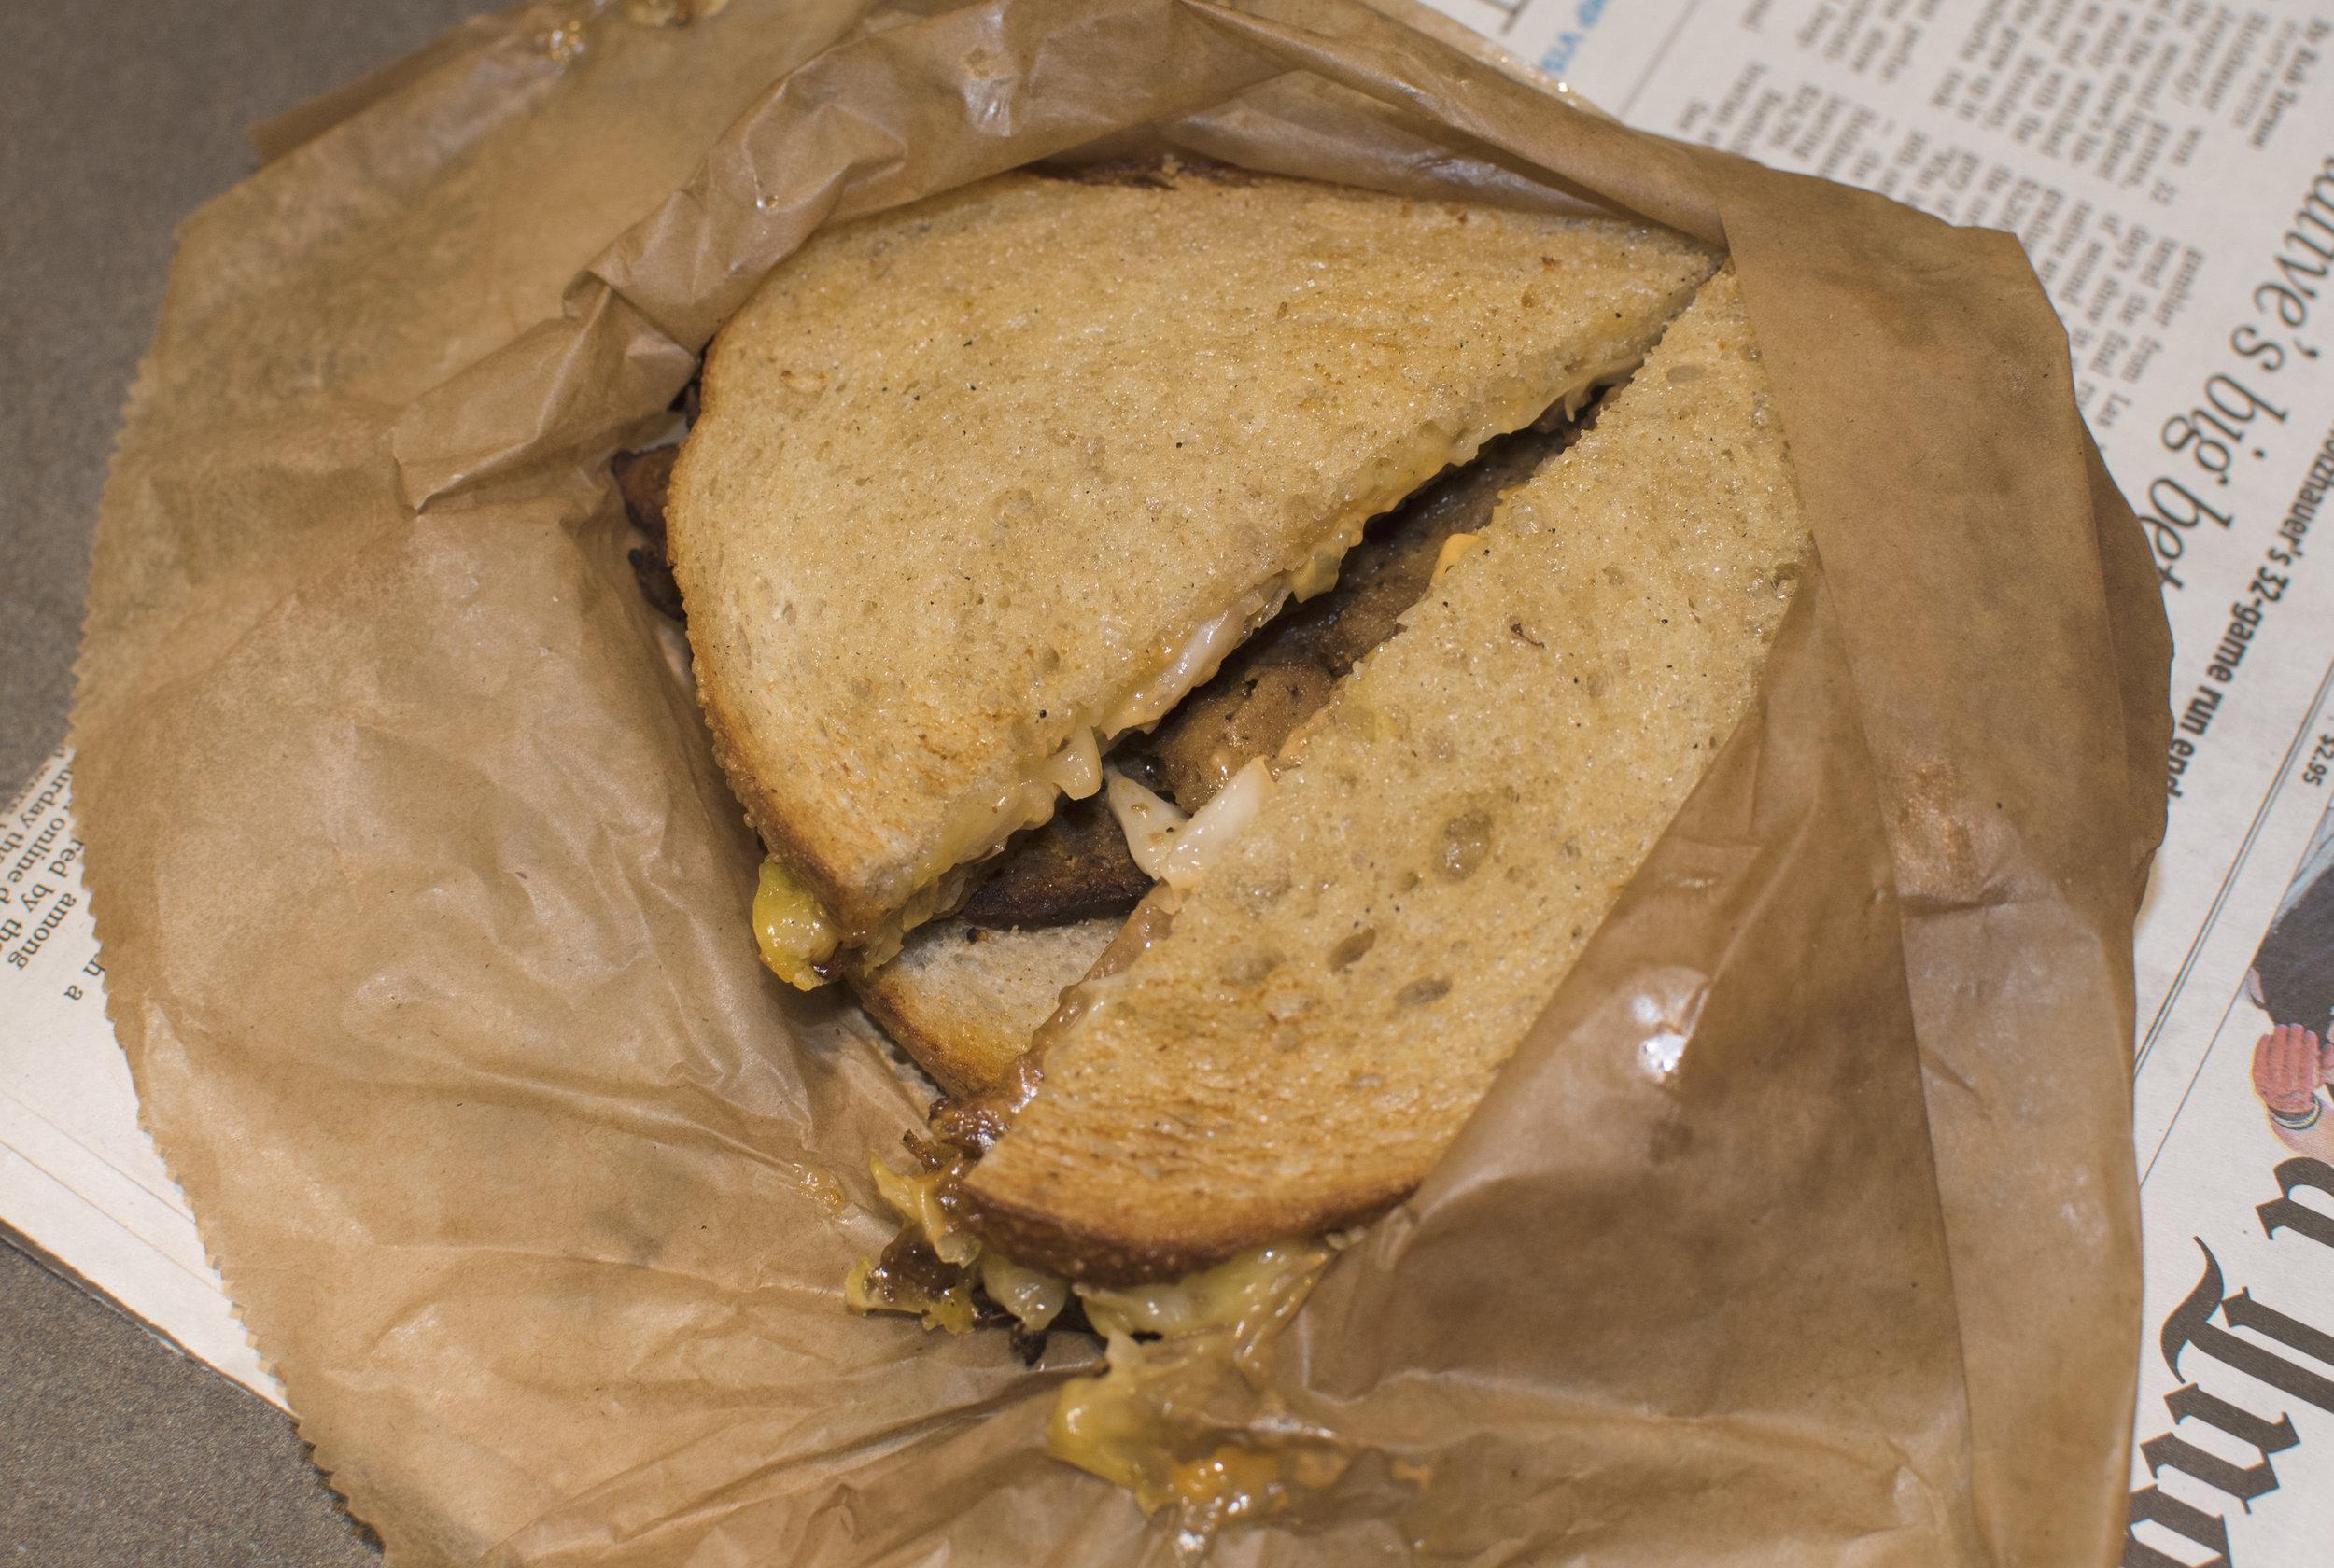 Vegan-Reuben-Sandwich-Reading-Terminal-Market.jpg